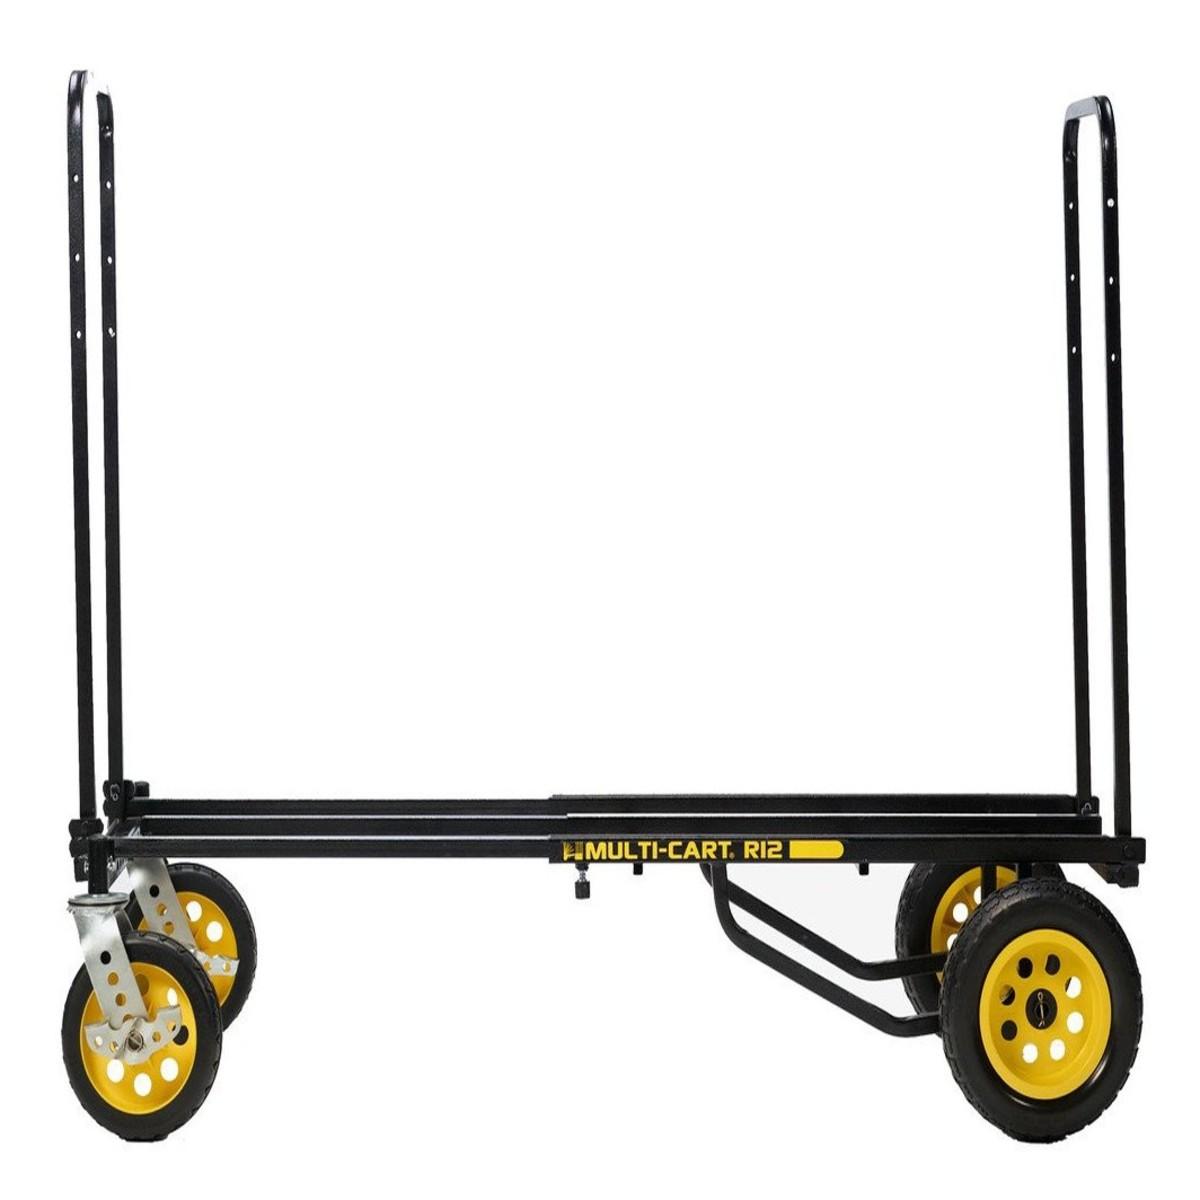 rock n roller r12 multicart tout terrain avec r trac capacit de 500lb. Black Bedroom Furniture Sets. Home Design Ideas